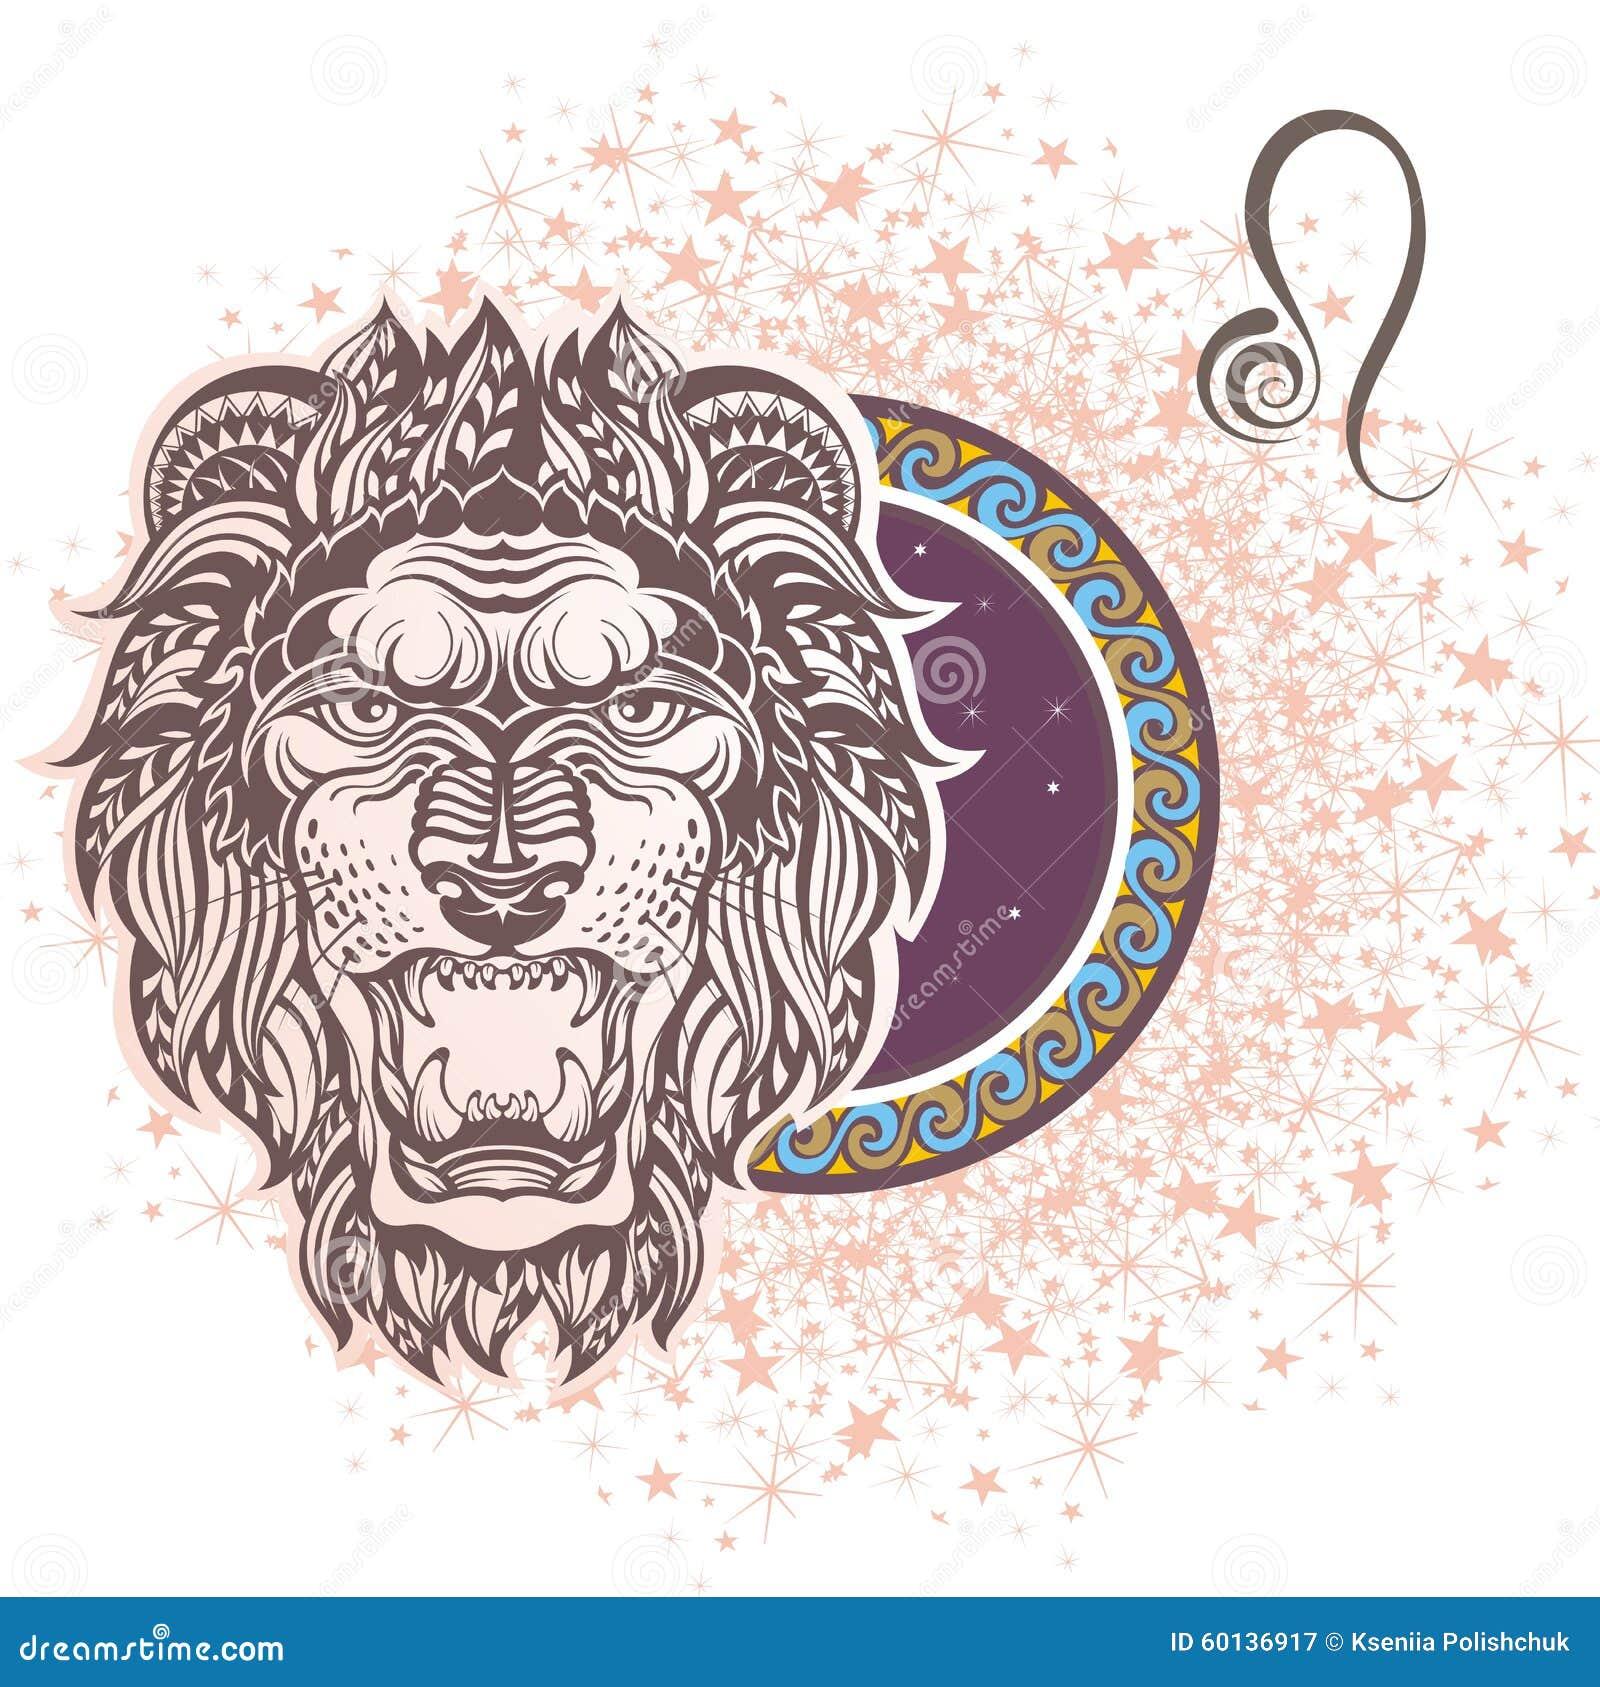 Leo Sinal do zodíaco